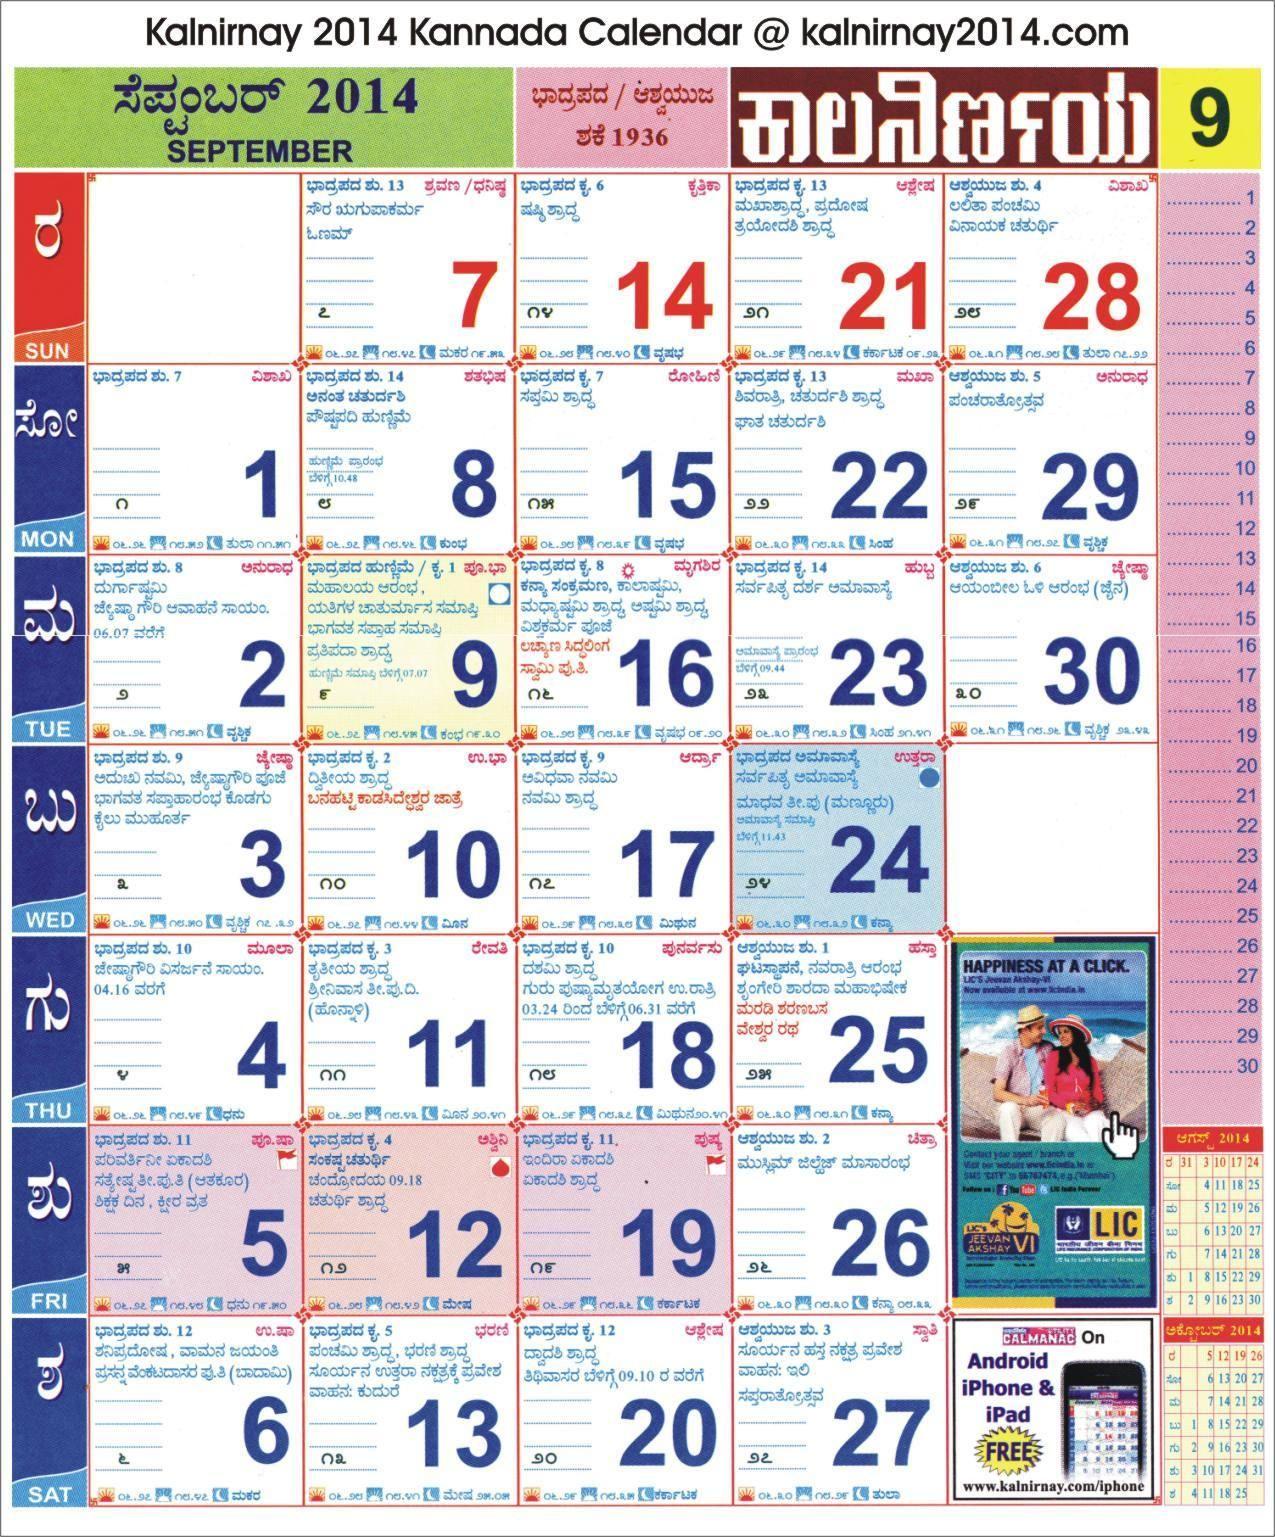 September 2014 Kannada Kalnirnay Calendar | February pertaining to Kannada Calendar 2020 July